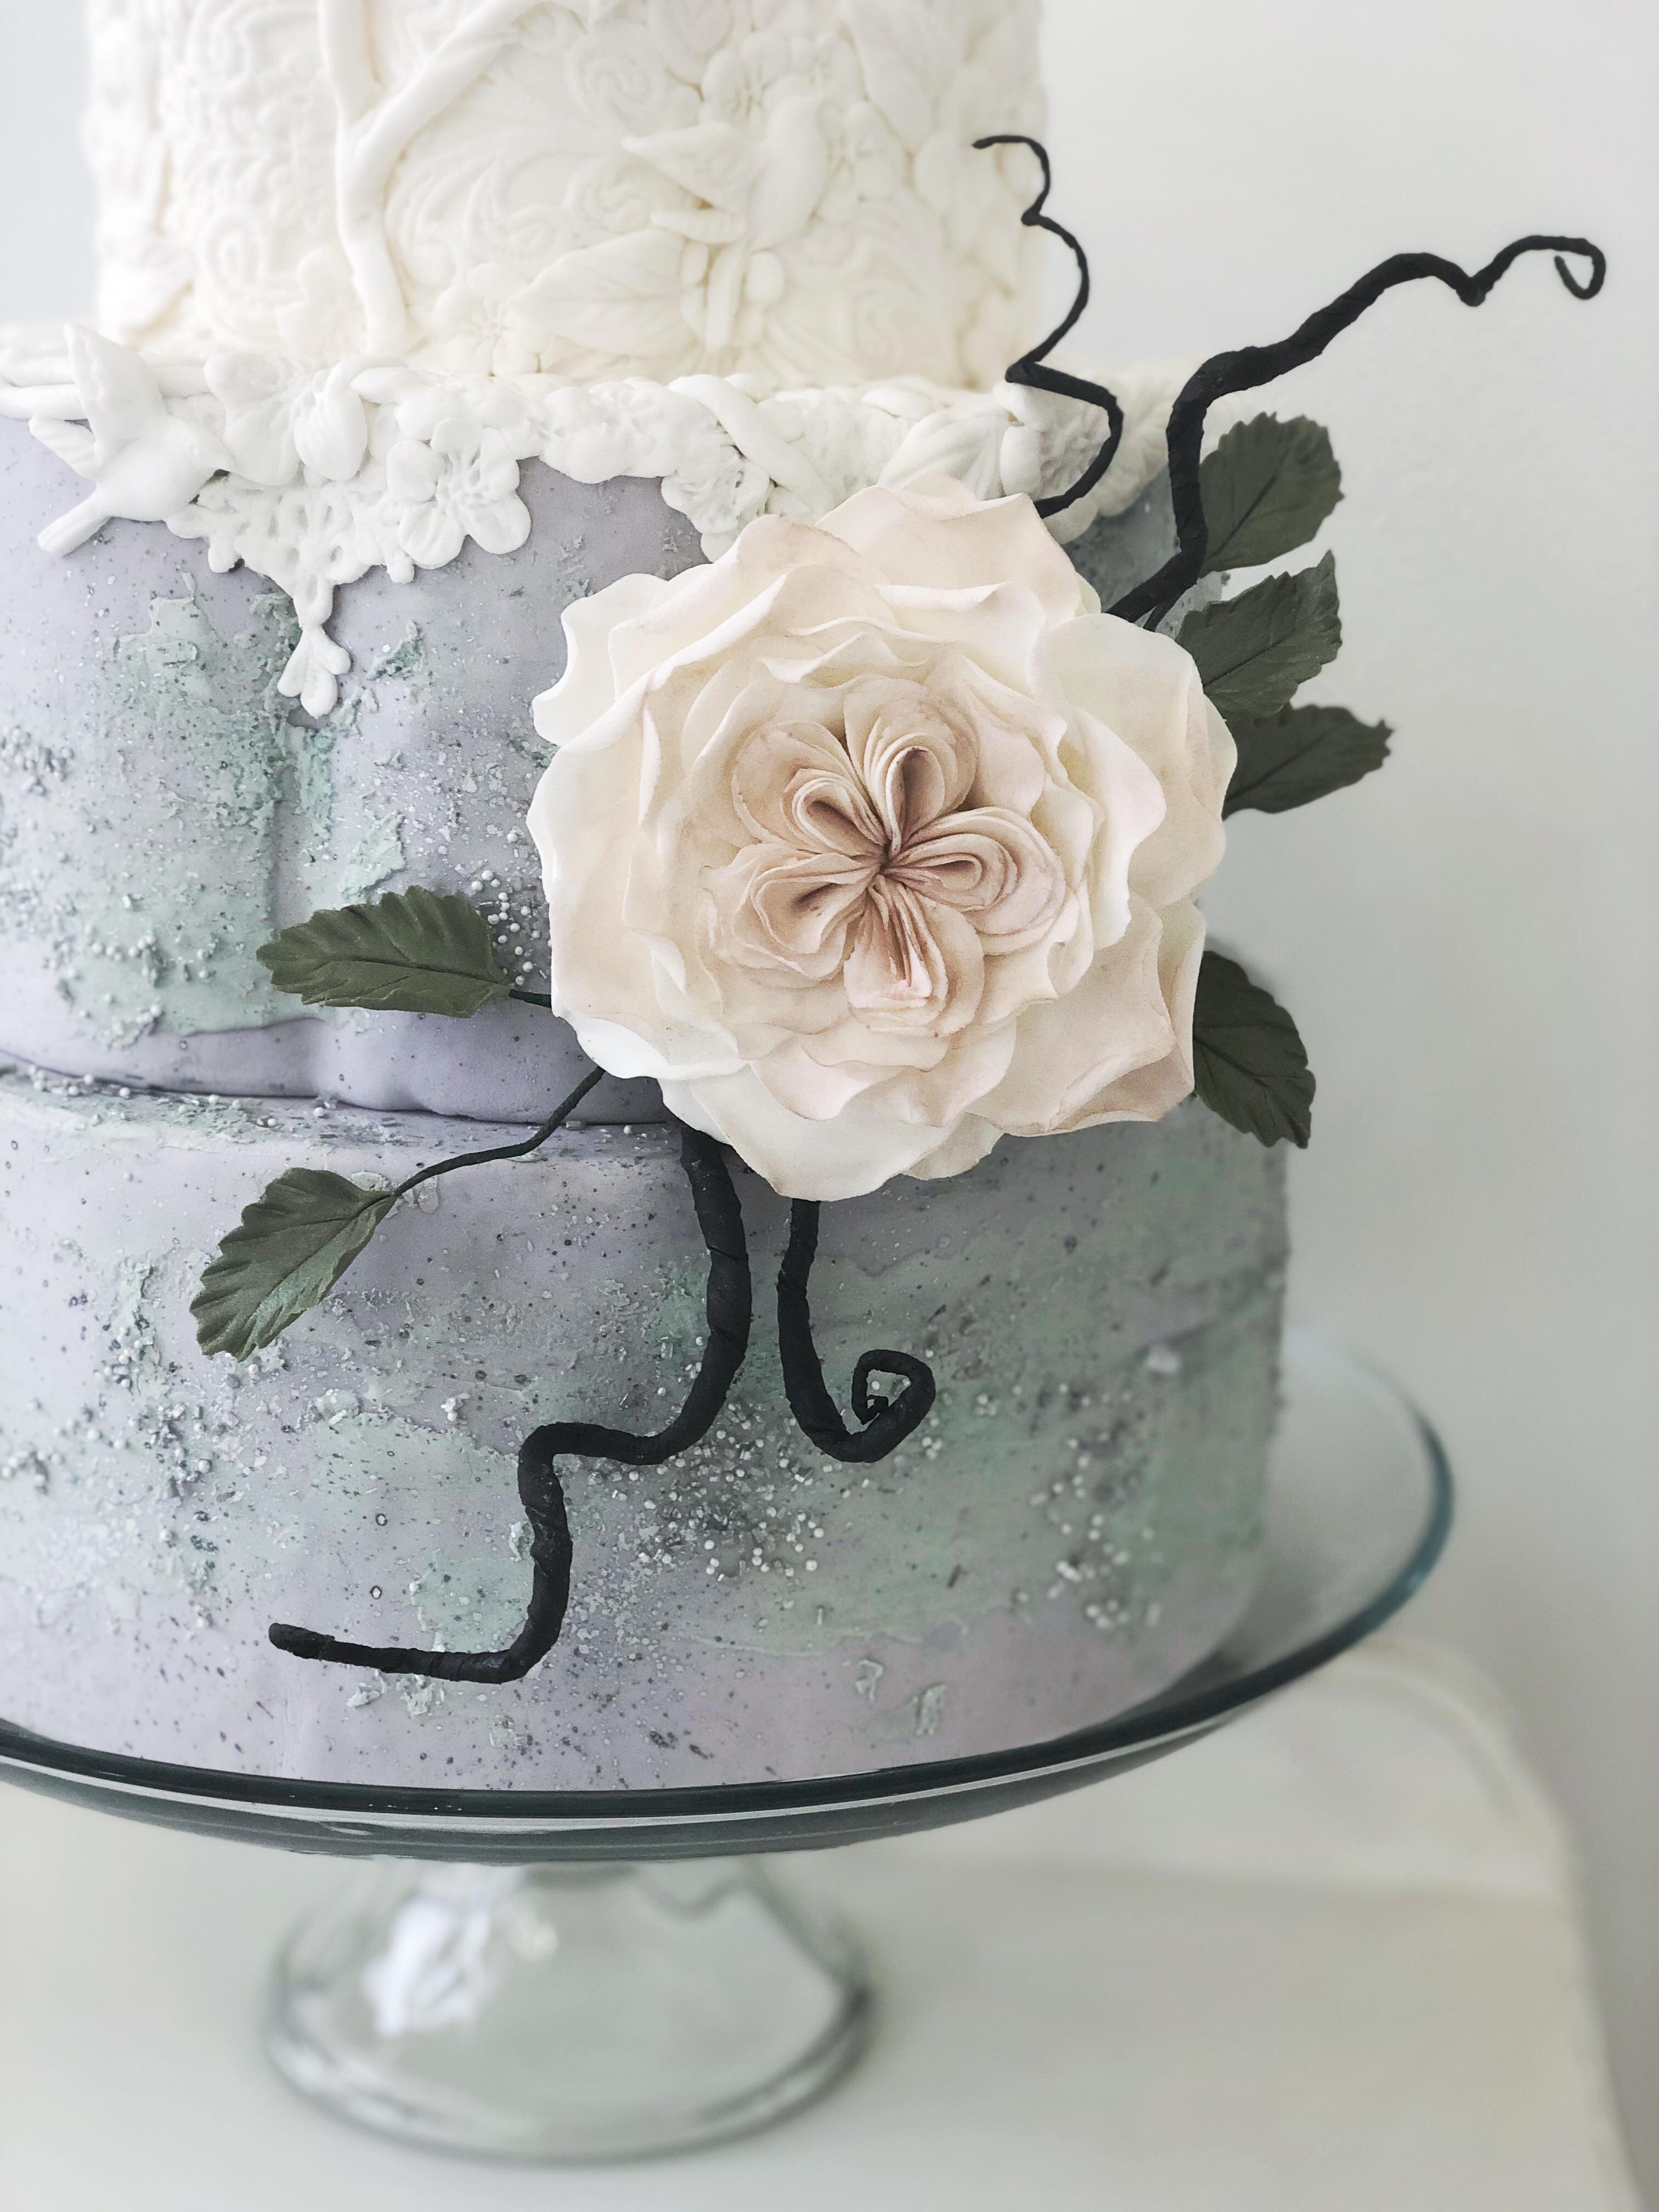 Gumpaste flower detail